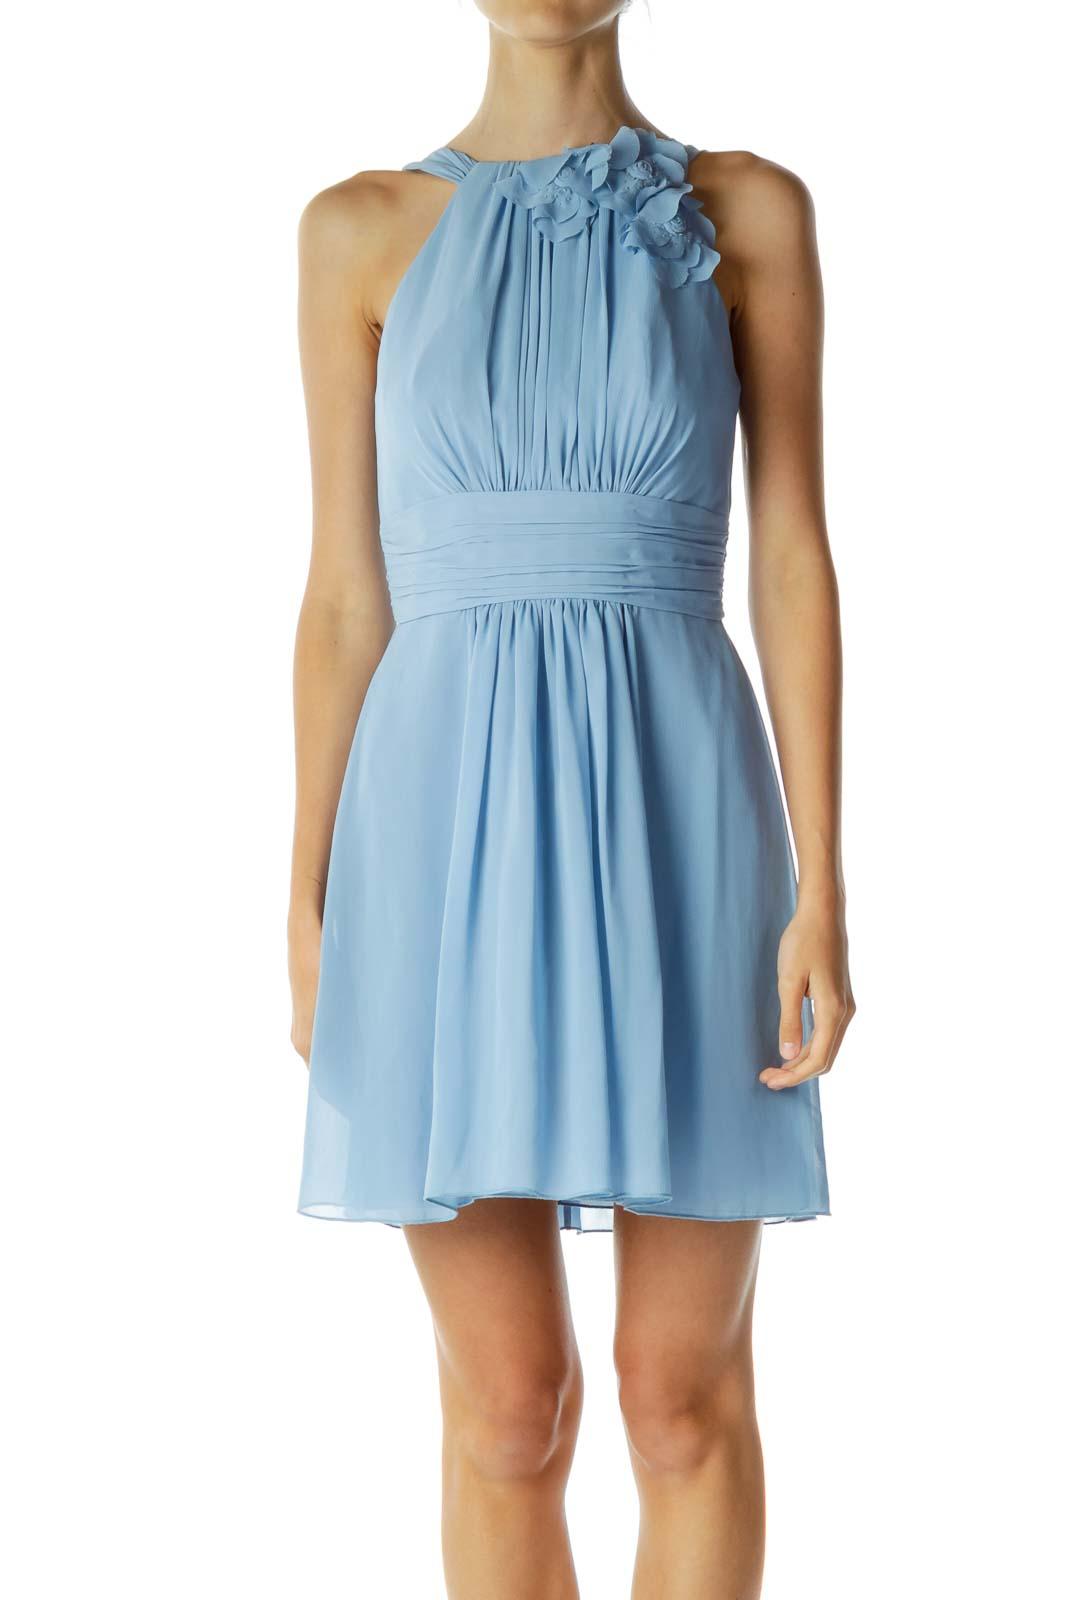 Blue Scrunched Flower Cocktail Dress